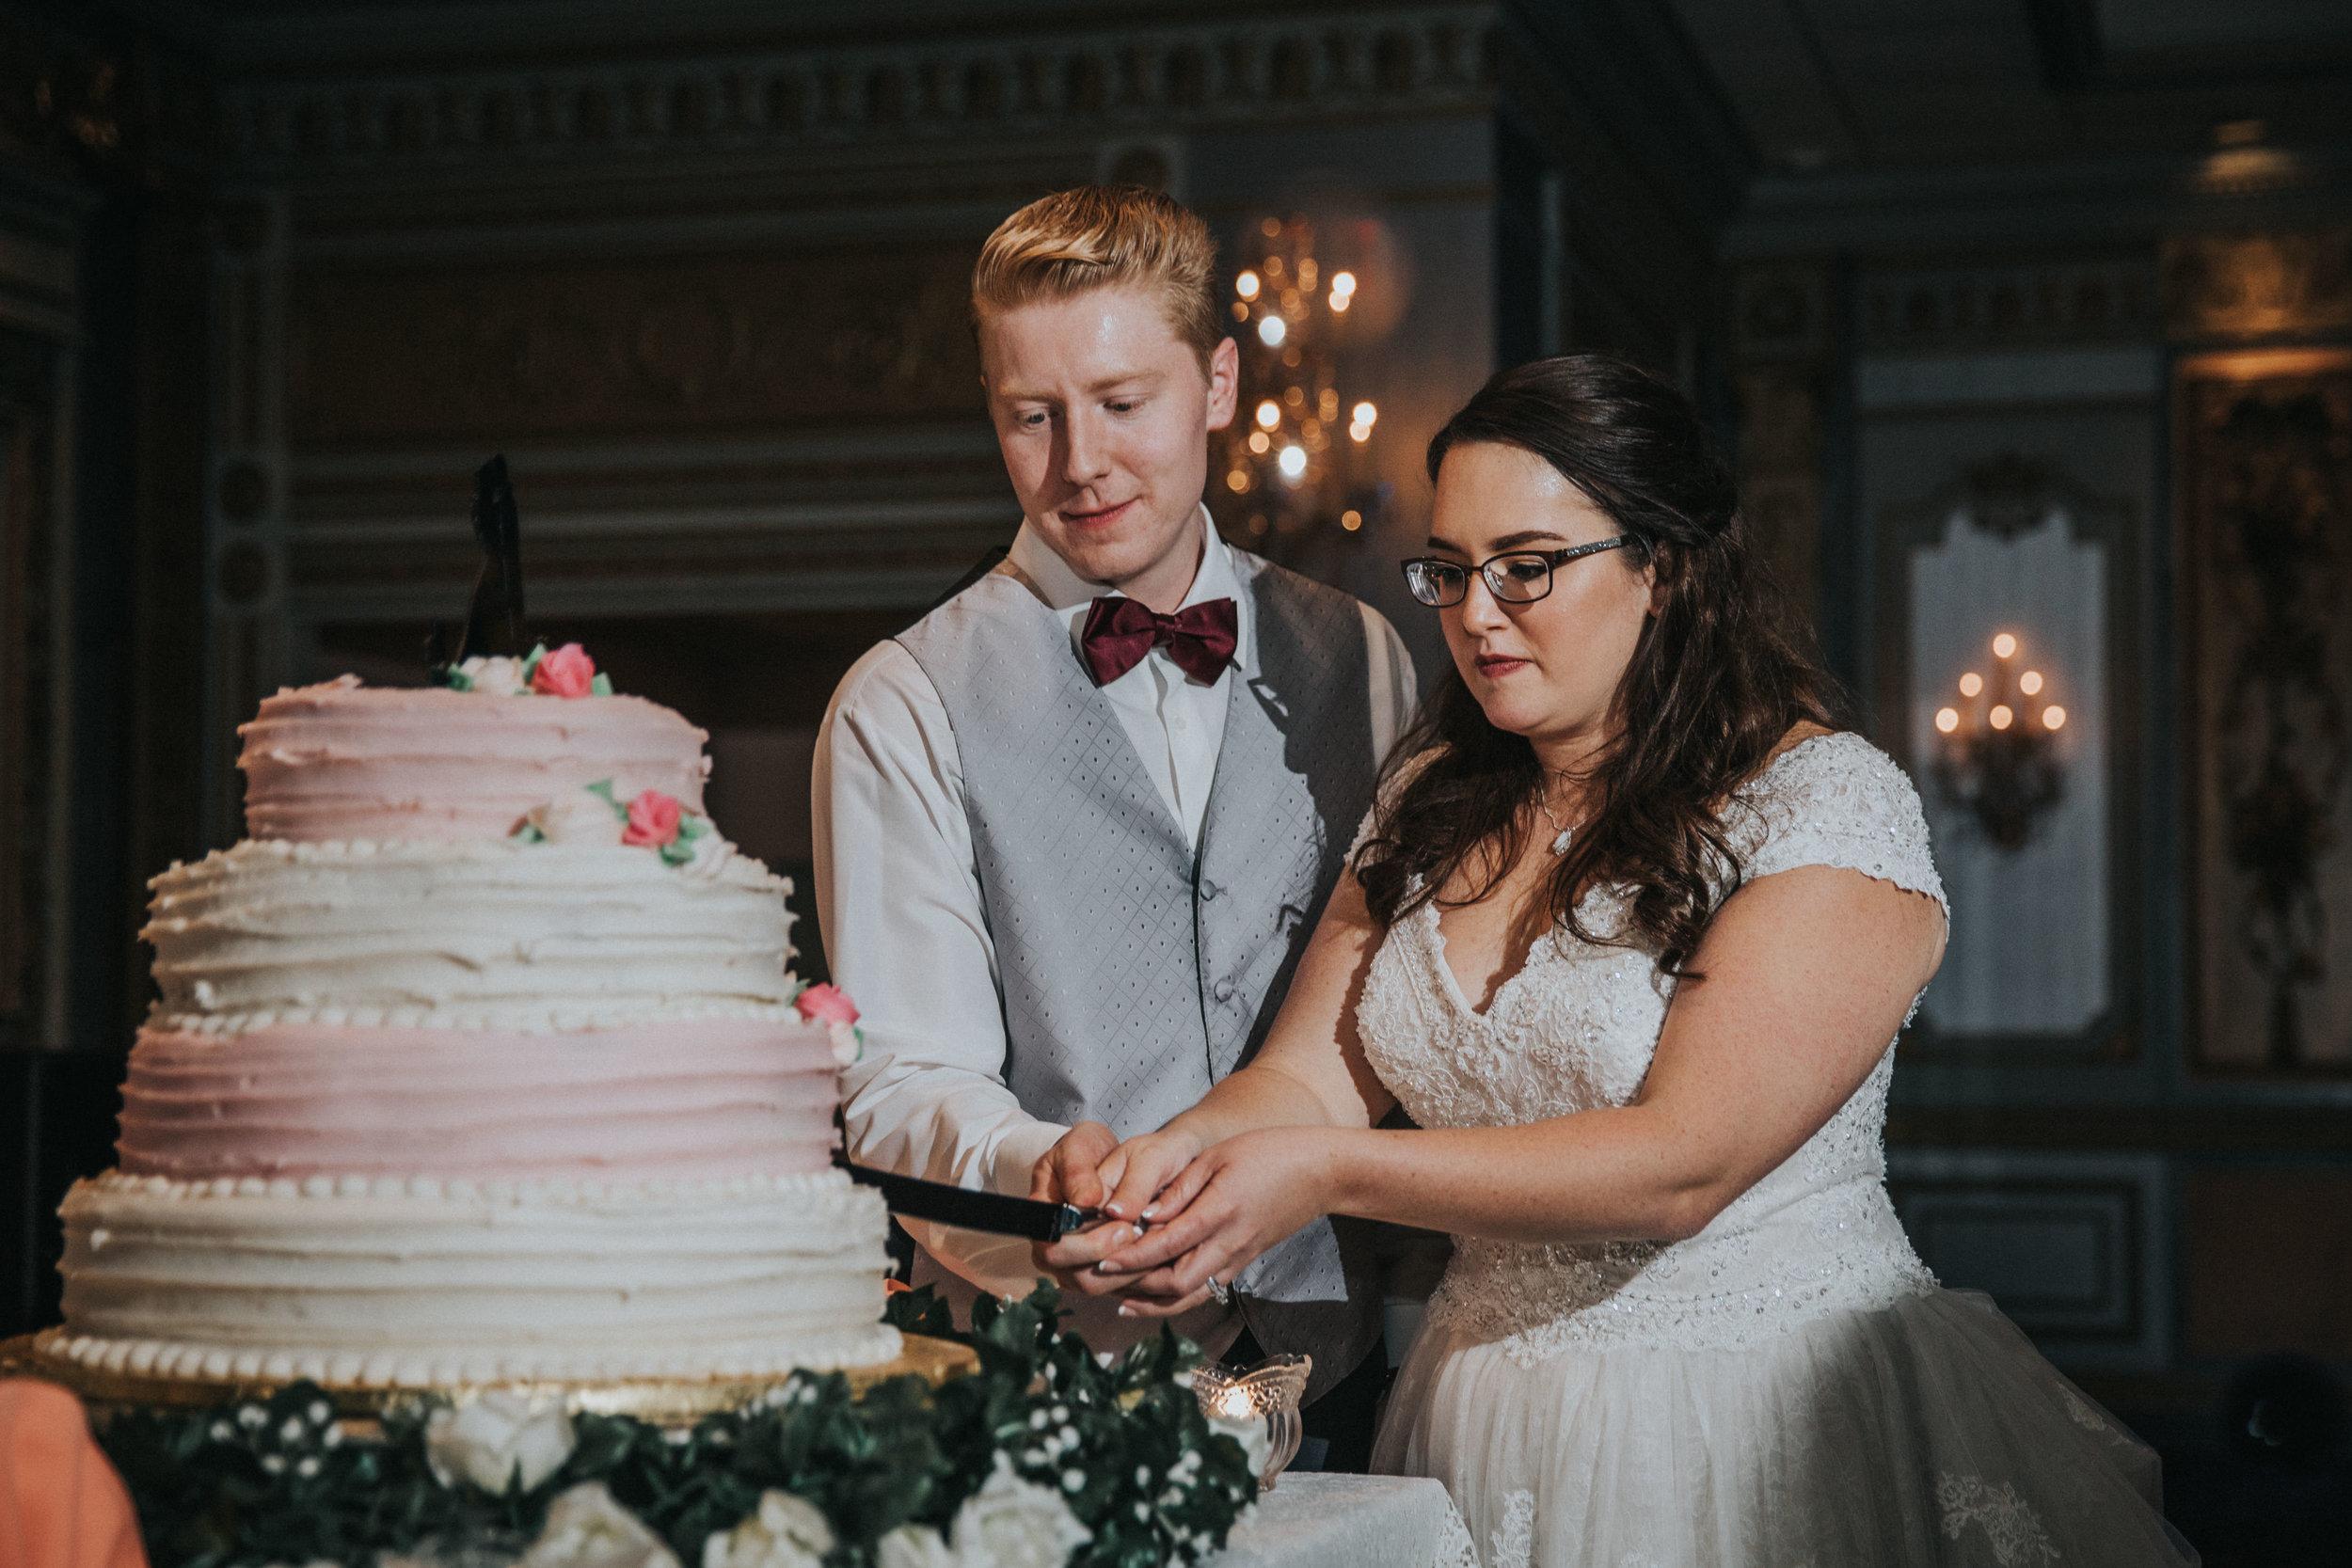 New-Jersey-Wedding-Photography-Fishers-Tudor-House-JennaLynnPhotography-Reception-Kathleen&Eddie-182.jpg